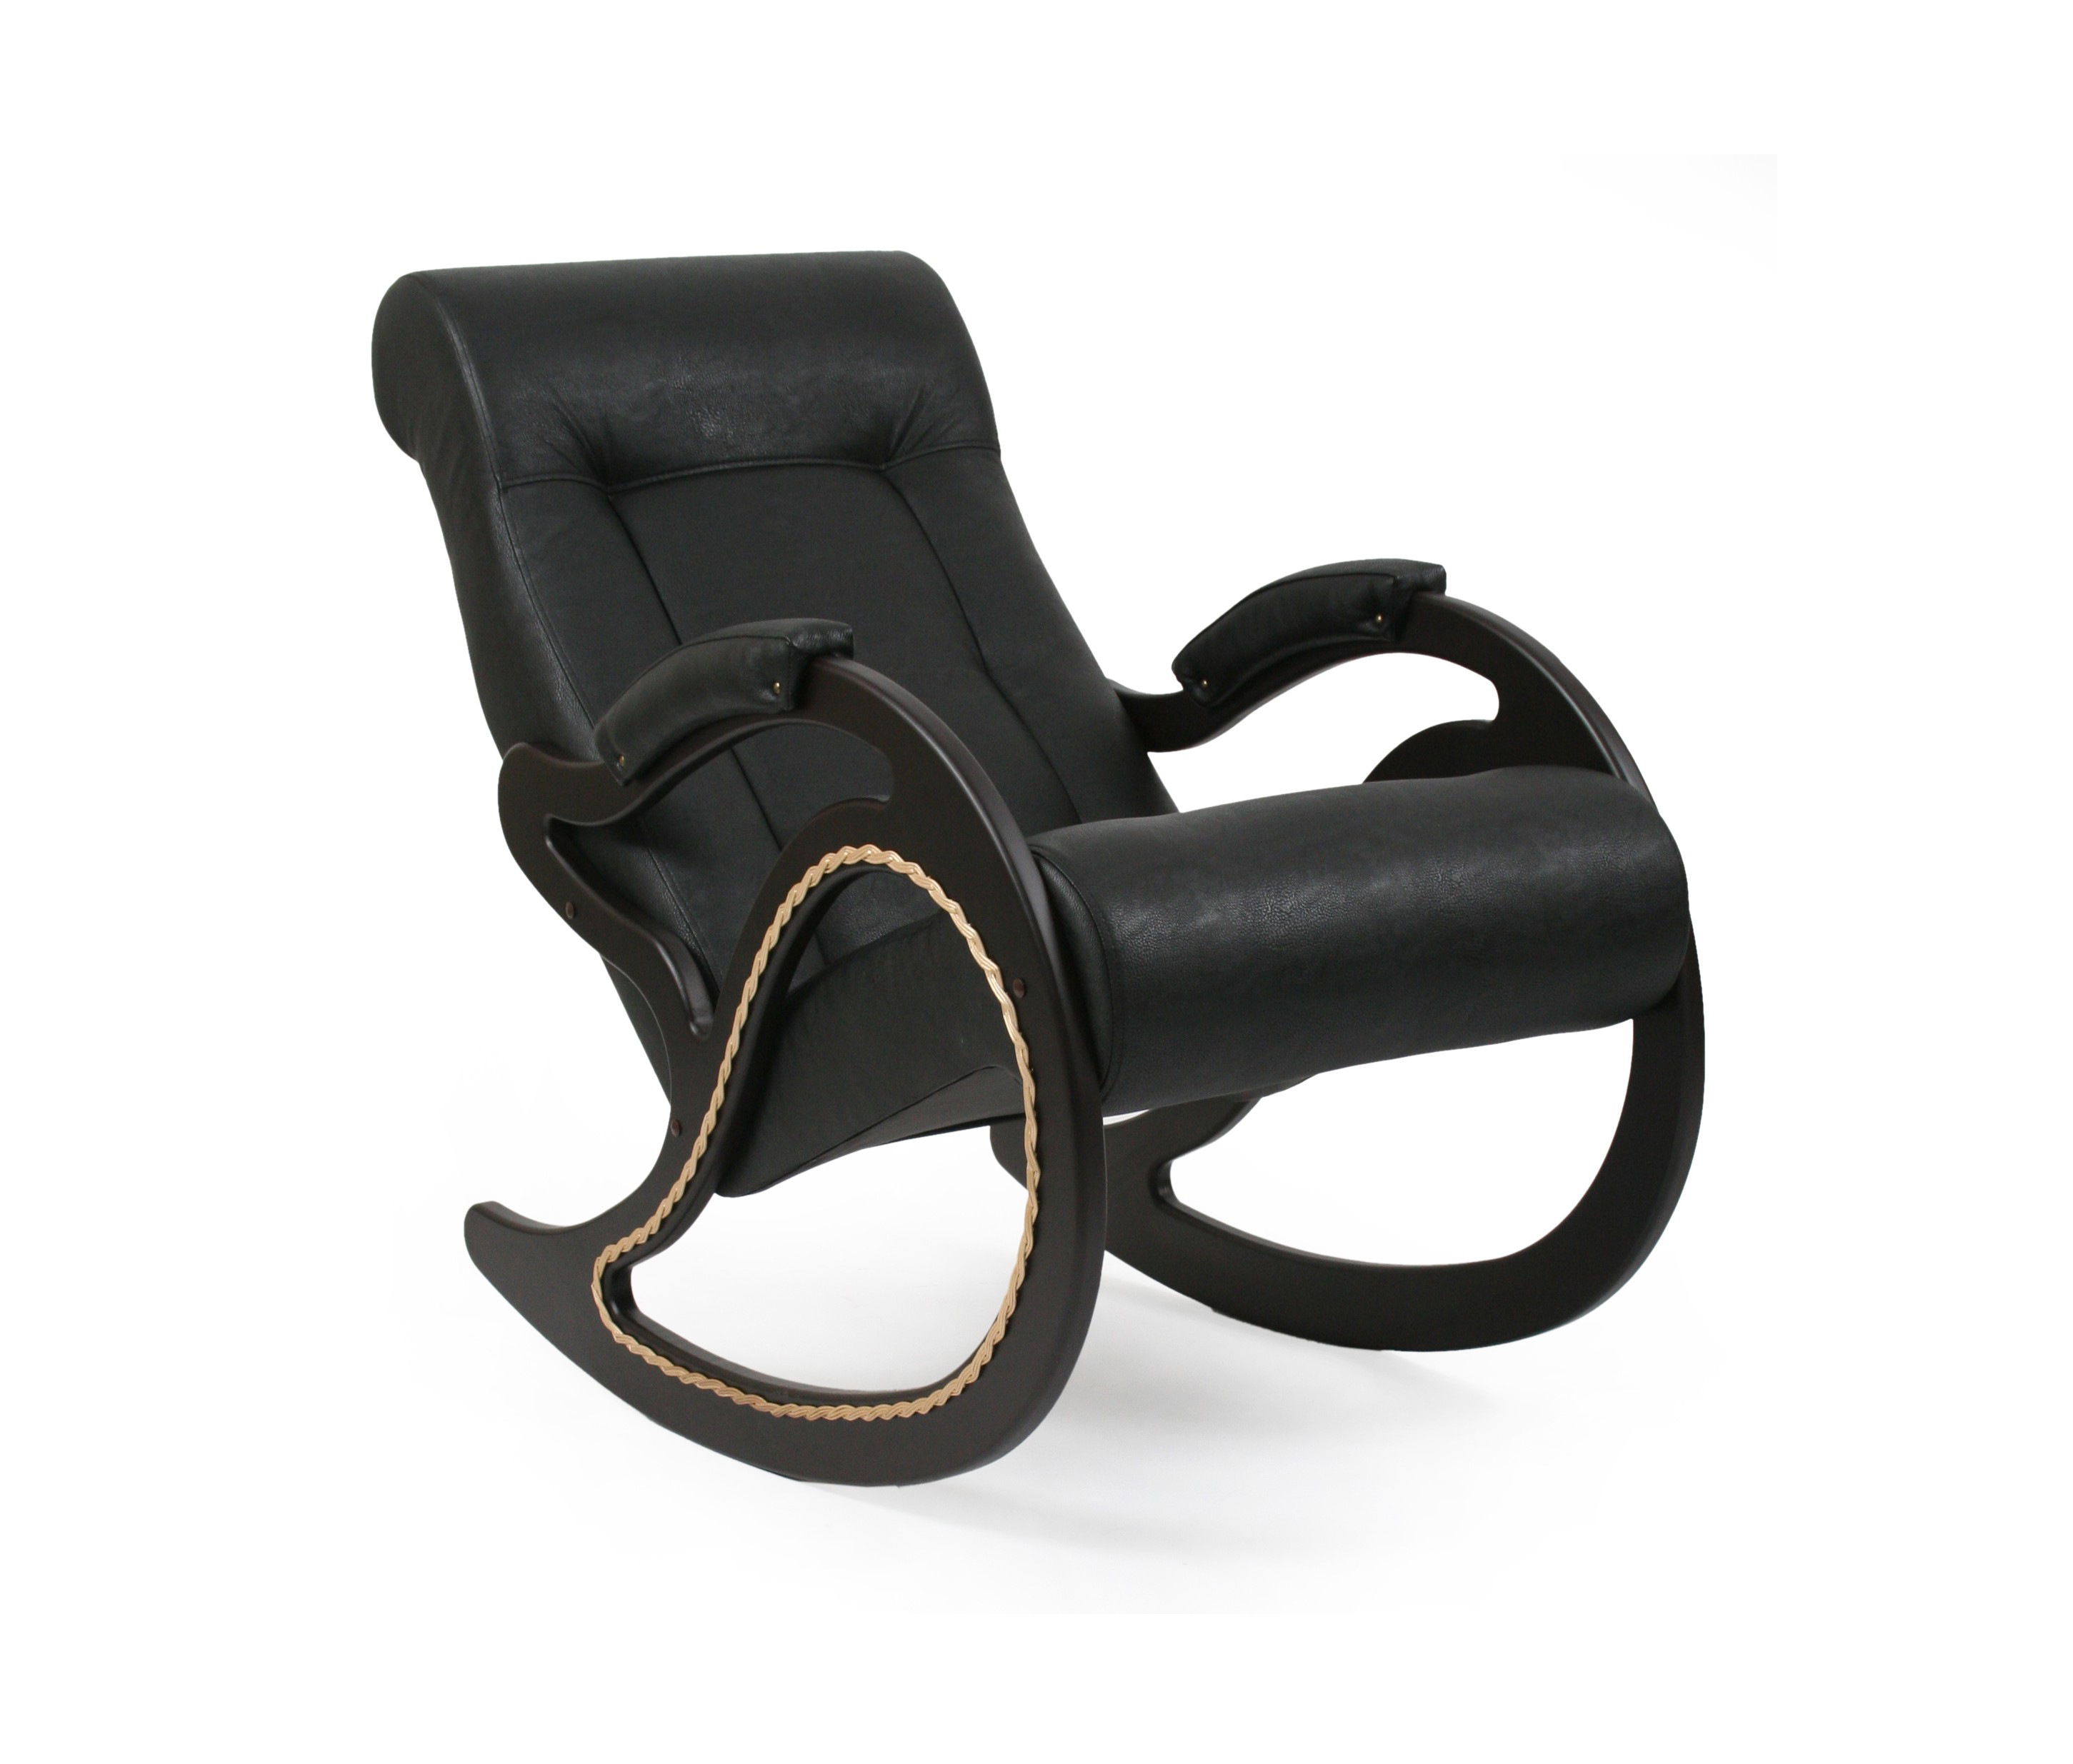 Кресло-качалка модель 7 детские кроватки kitelli kito orsetto качалка